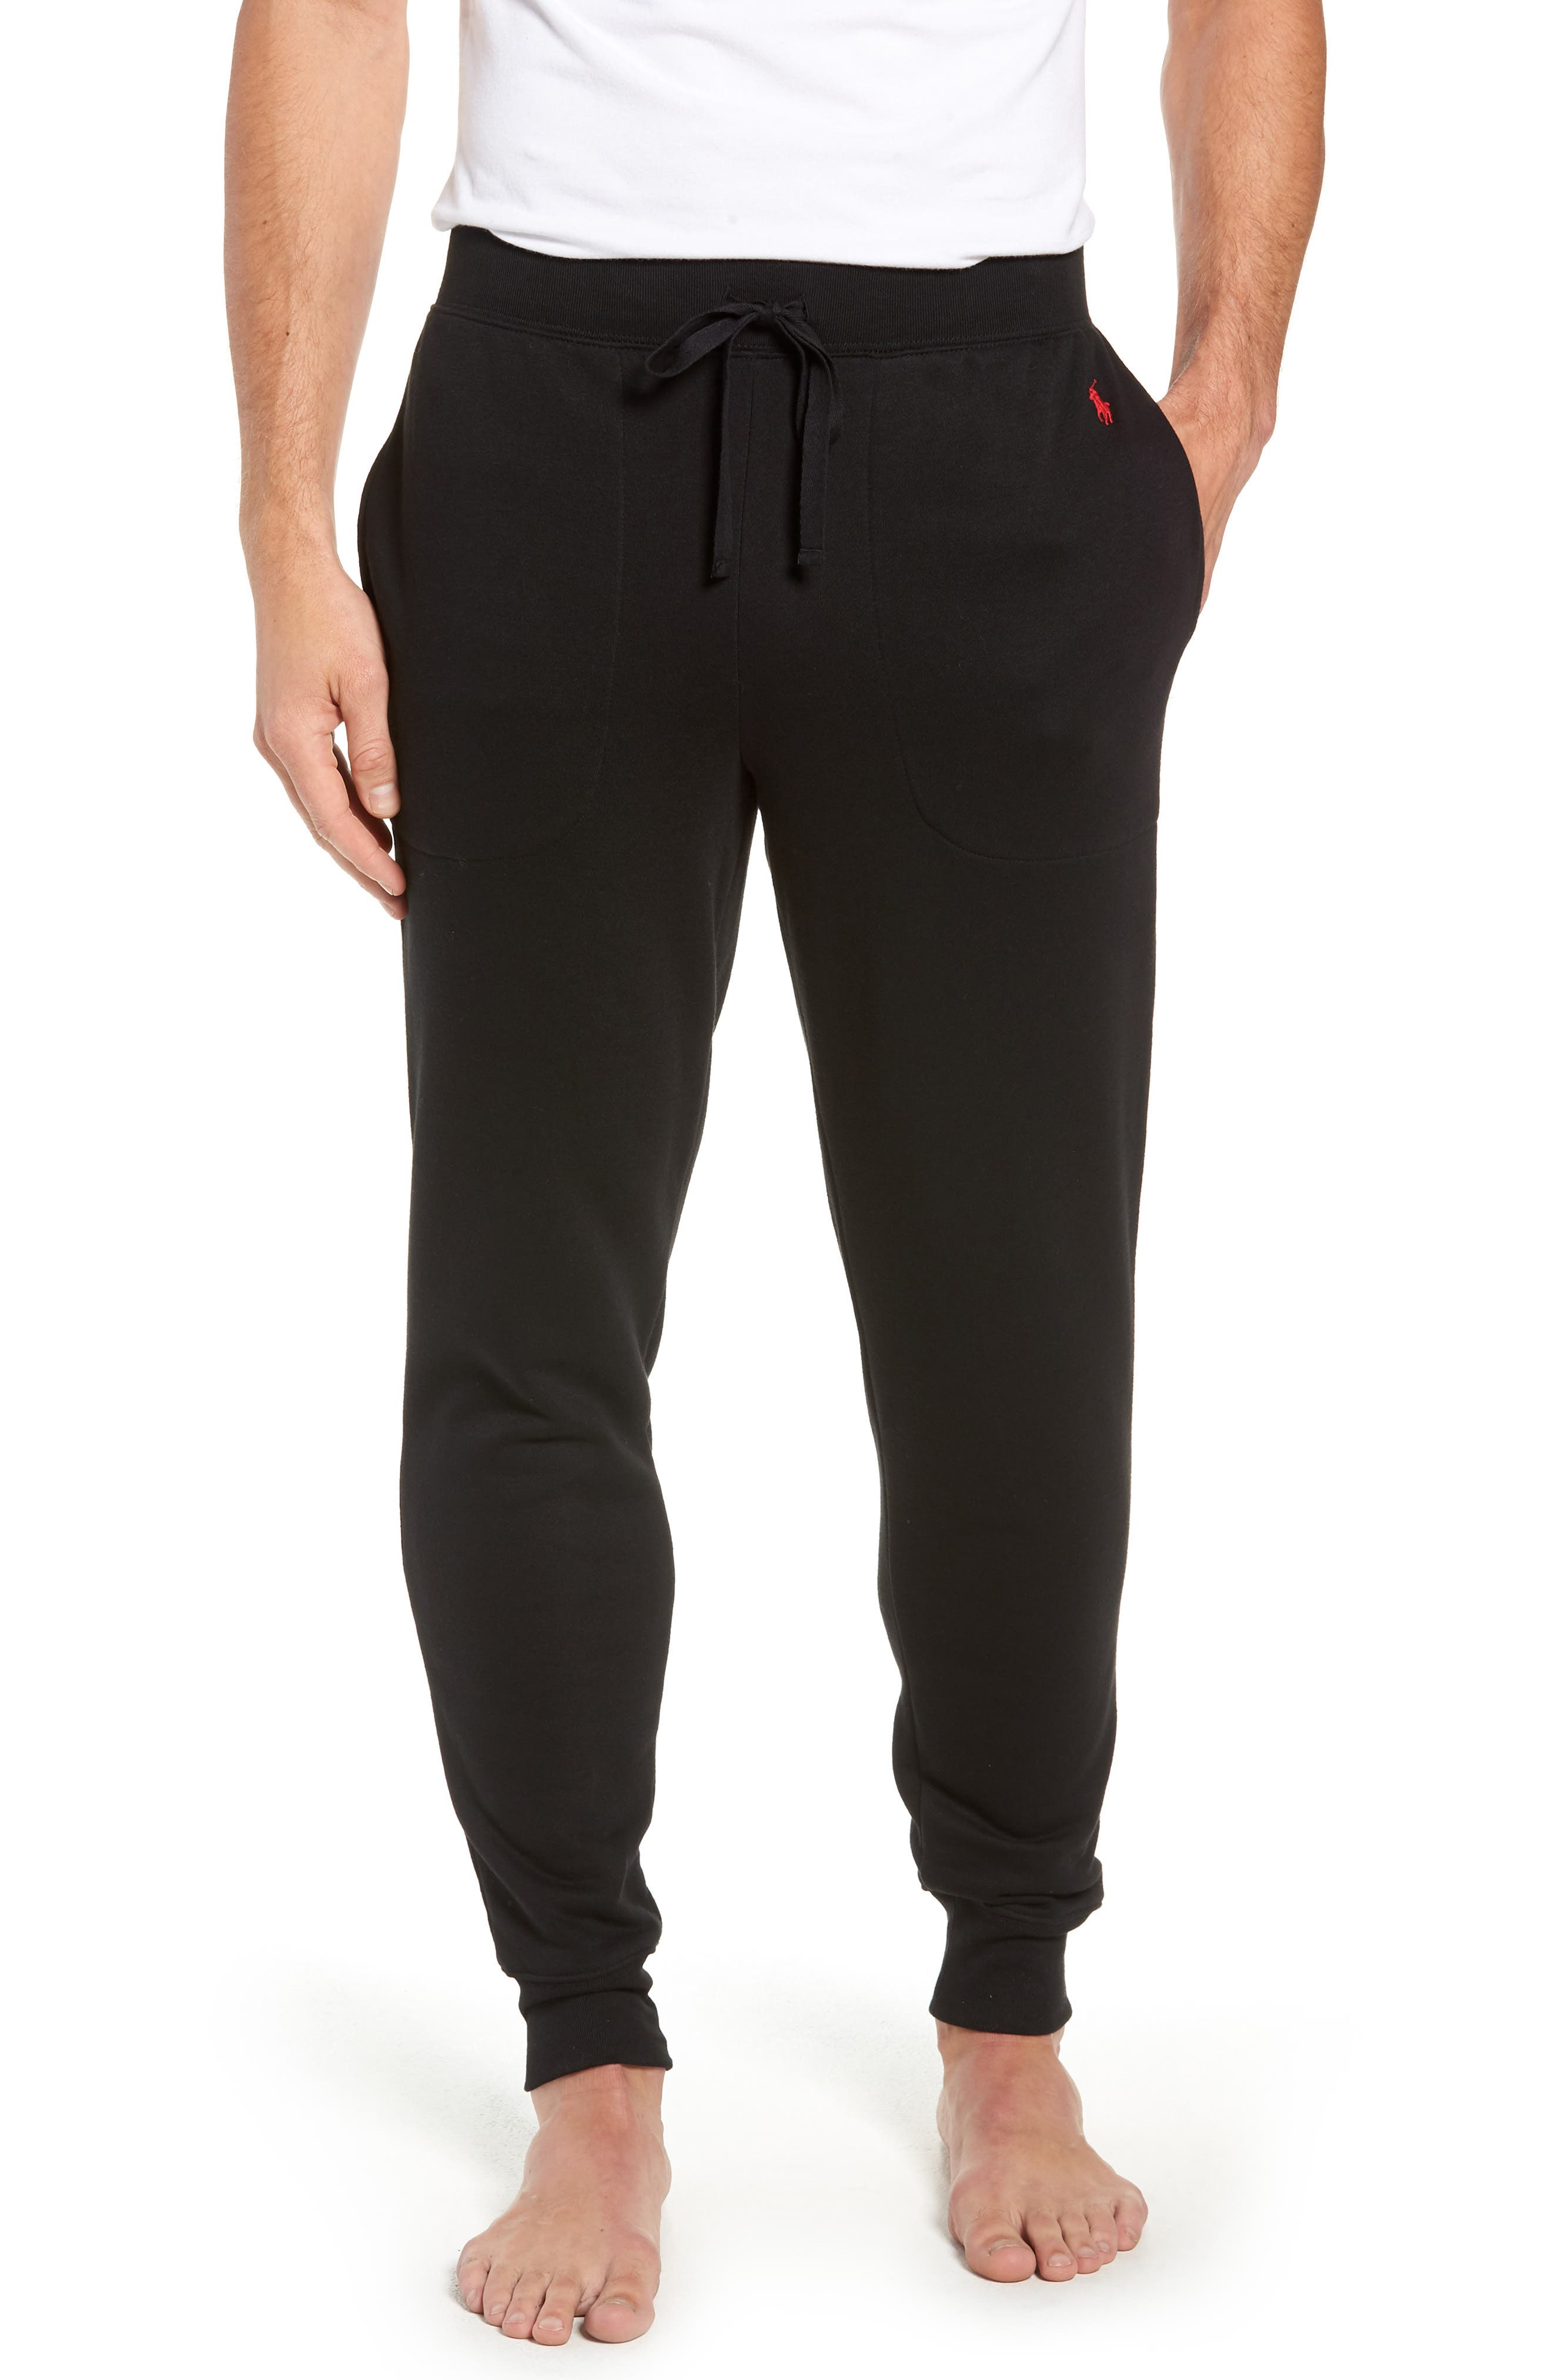 POLO RALPH LAUREN,                             Brushed Jersey Cotton Blend Jogger Pants,                             Main thumbnail 1, color,                             POLO BLACK